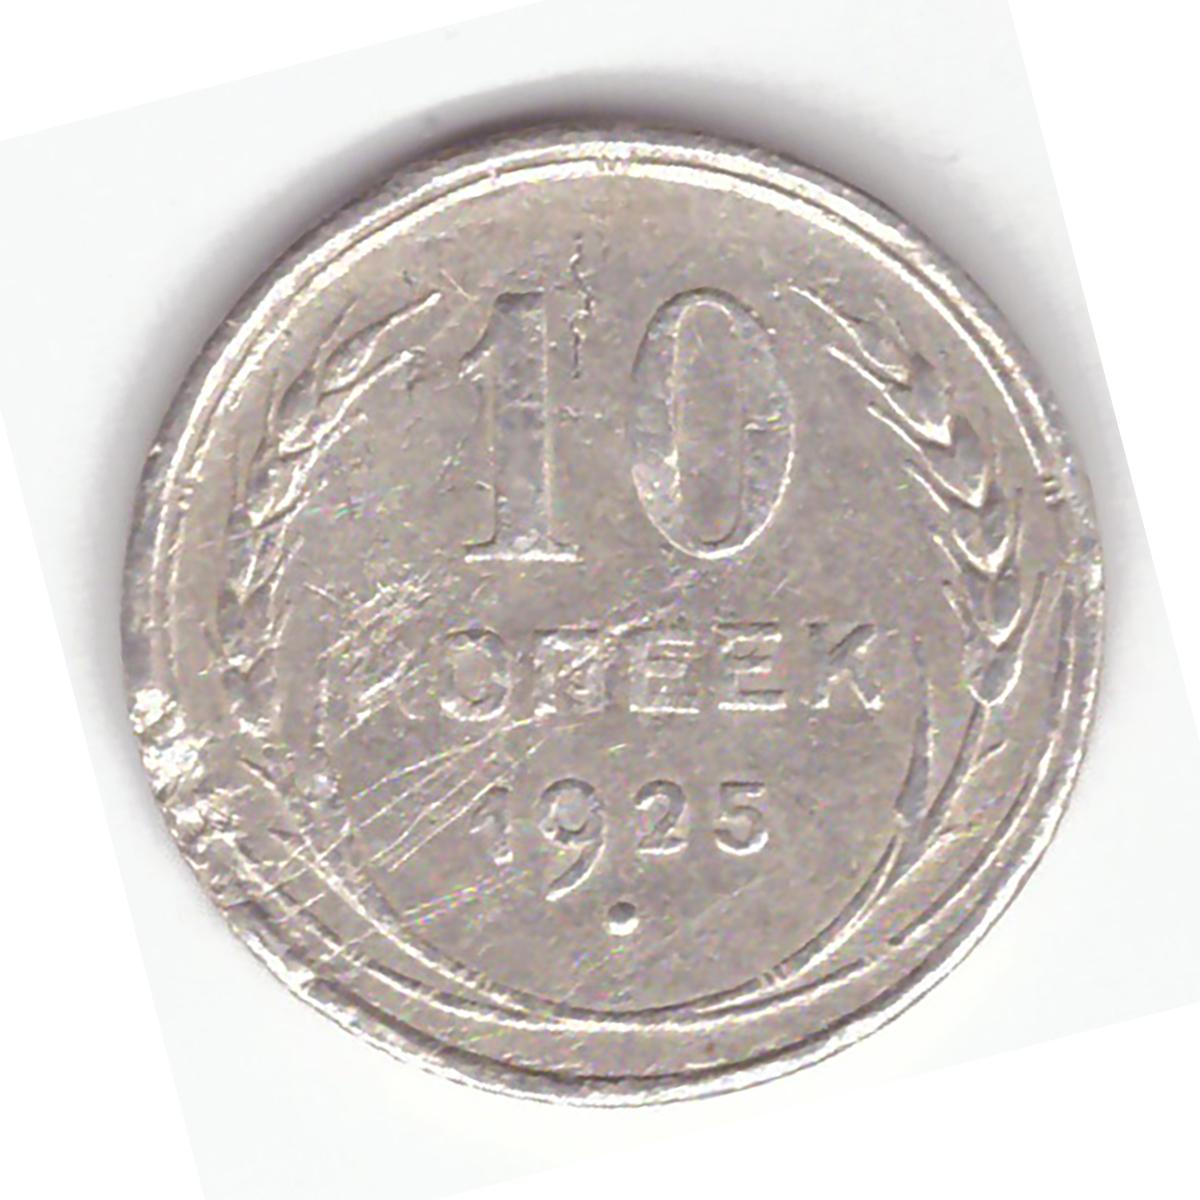 10 копеек 1925 года F №2